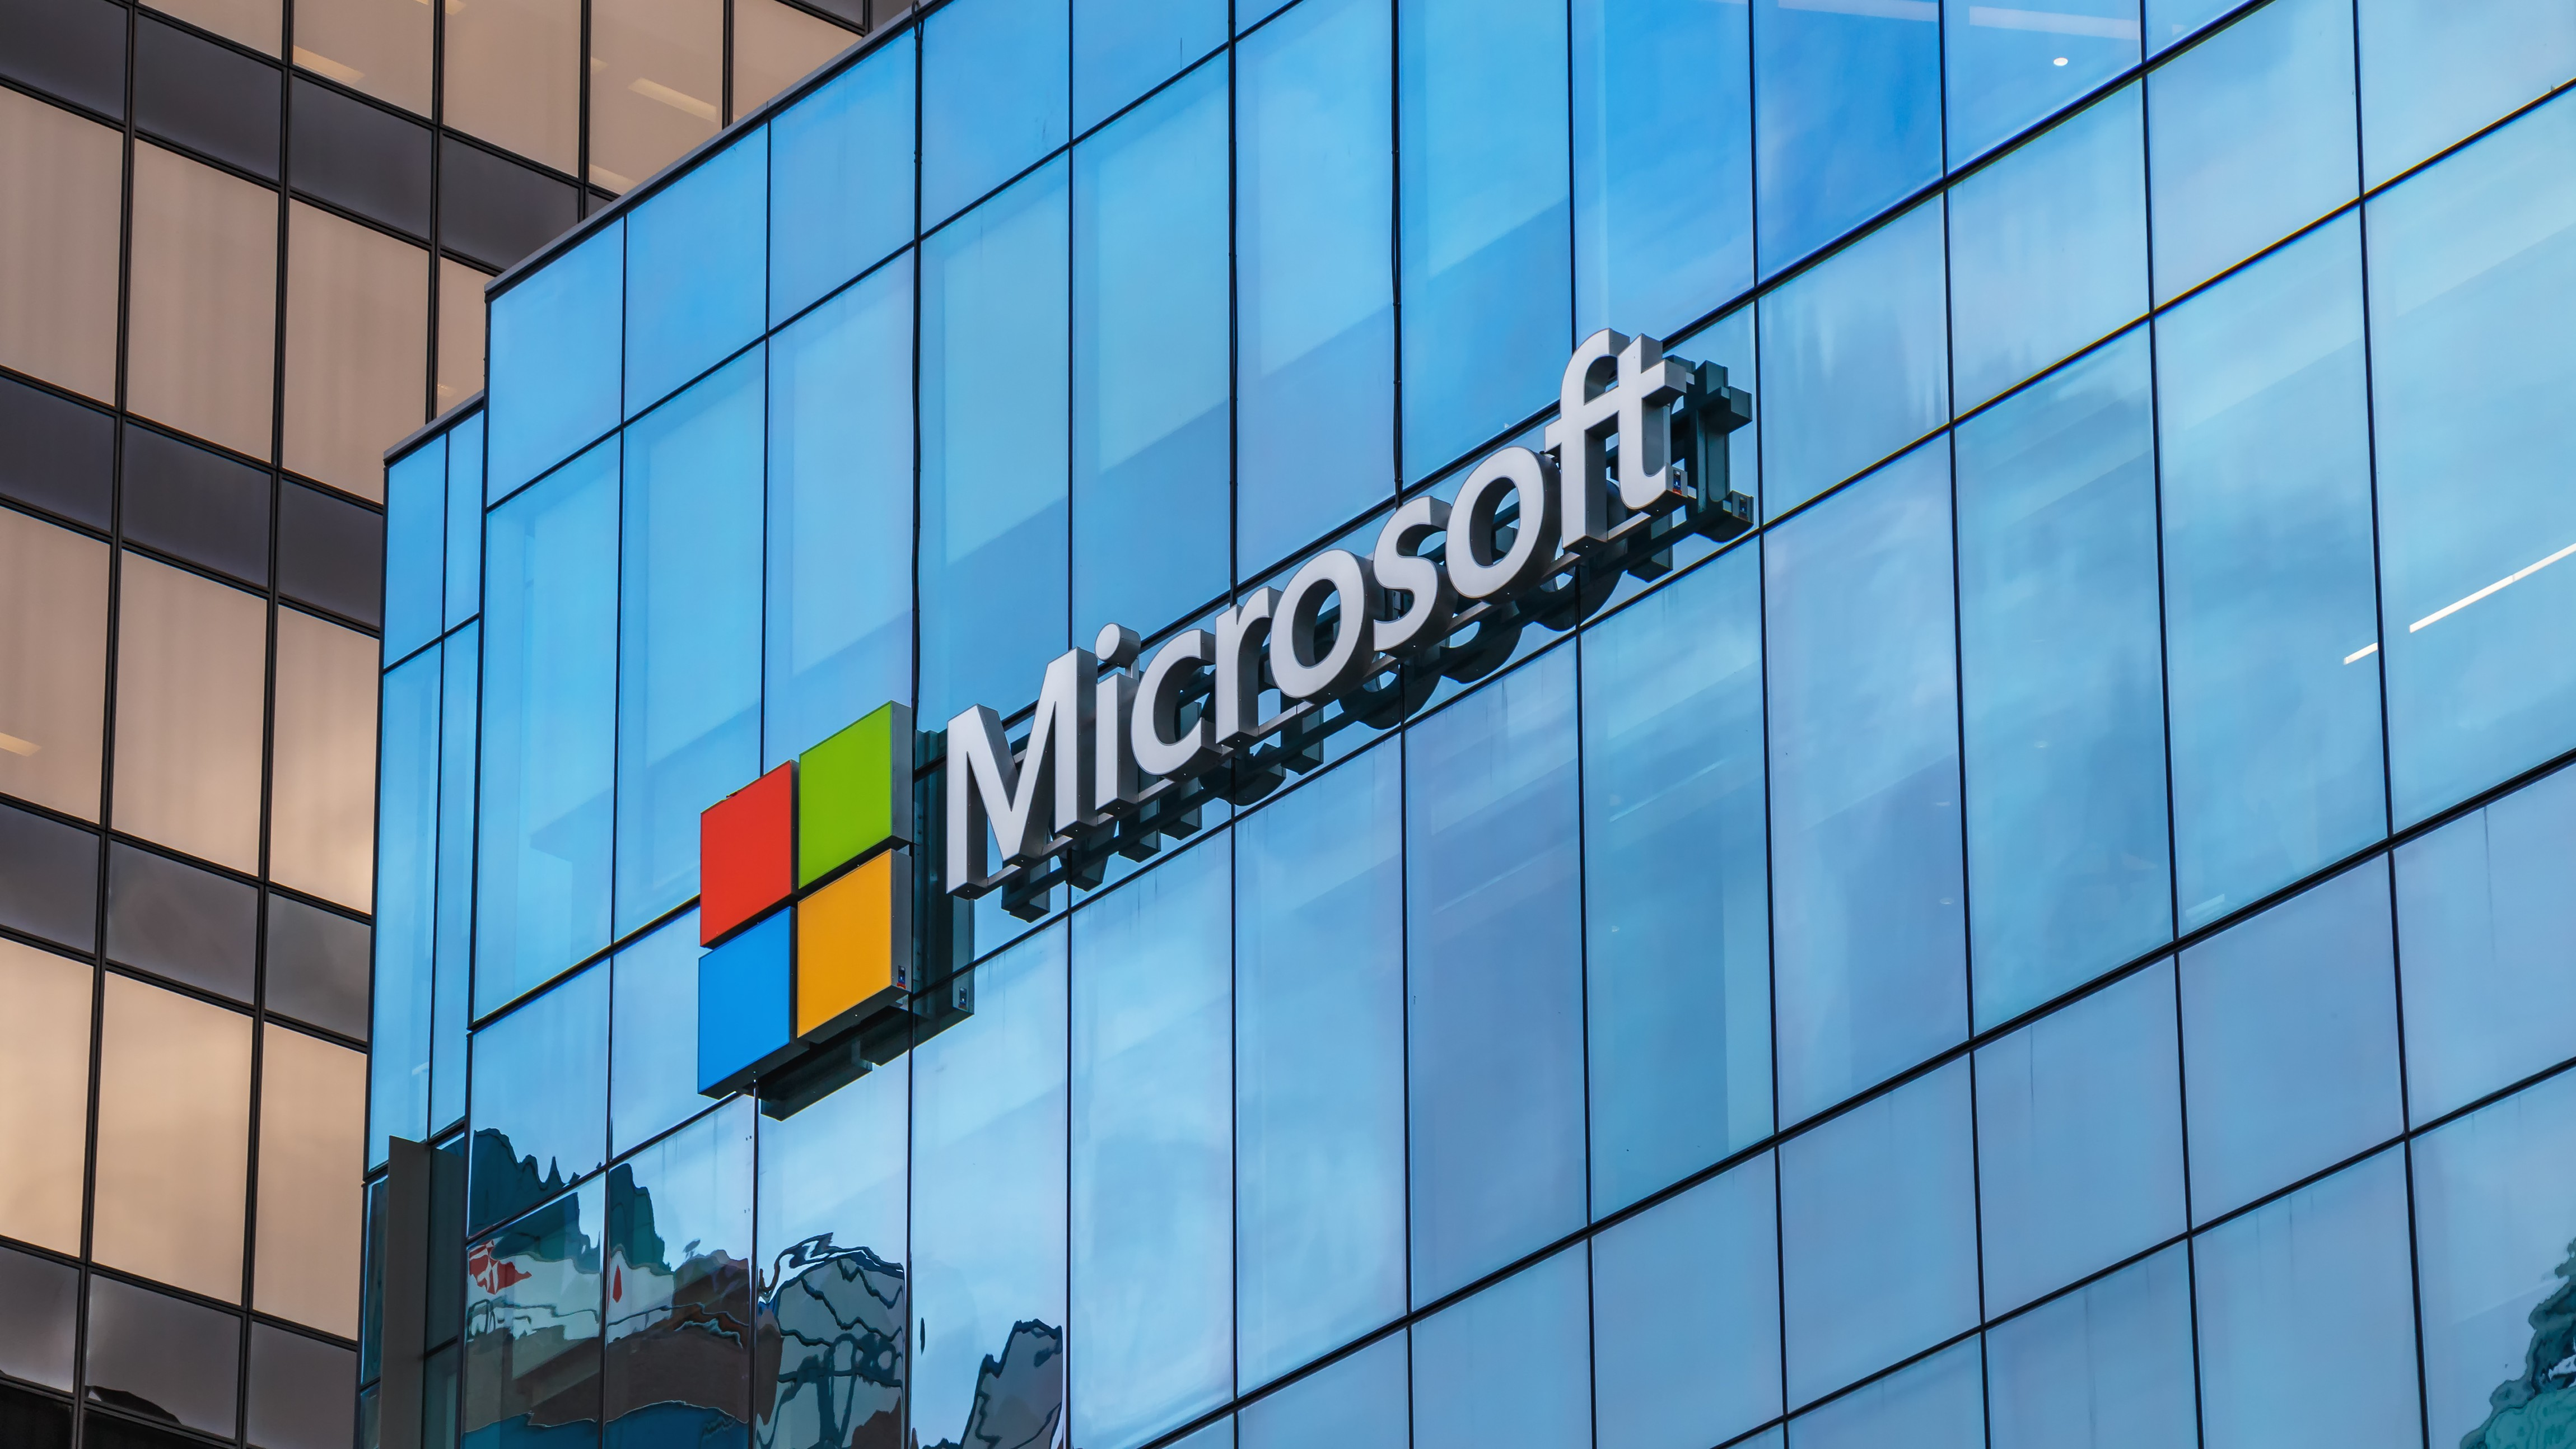 Microsoft Demands That Gab Delete Post Calling for 'Eradication of All Jews'